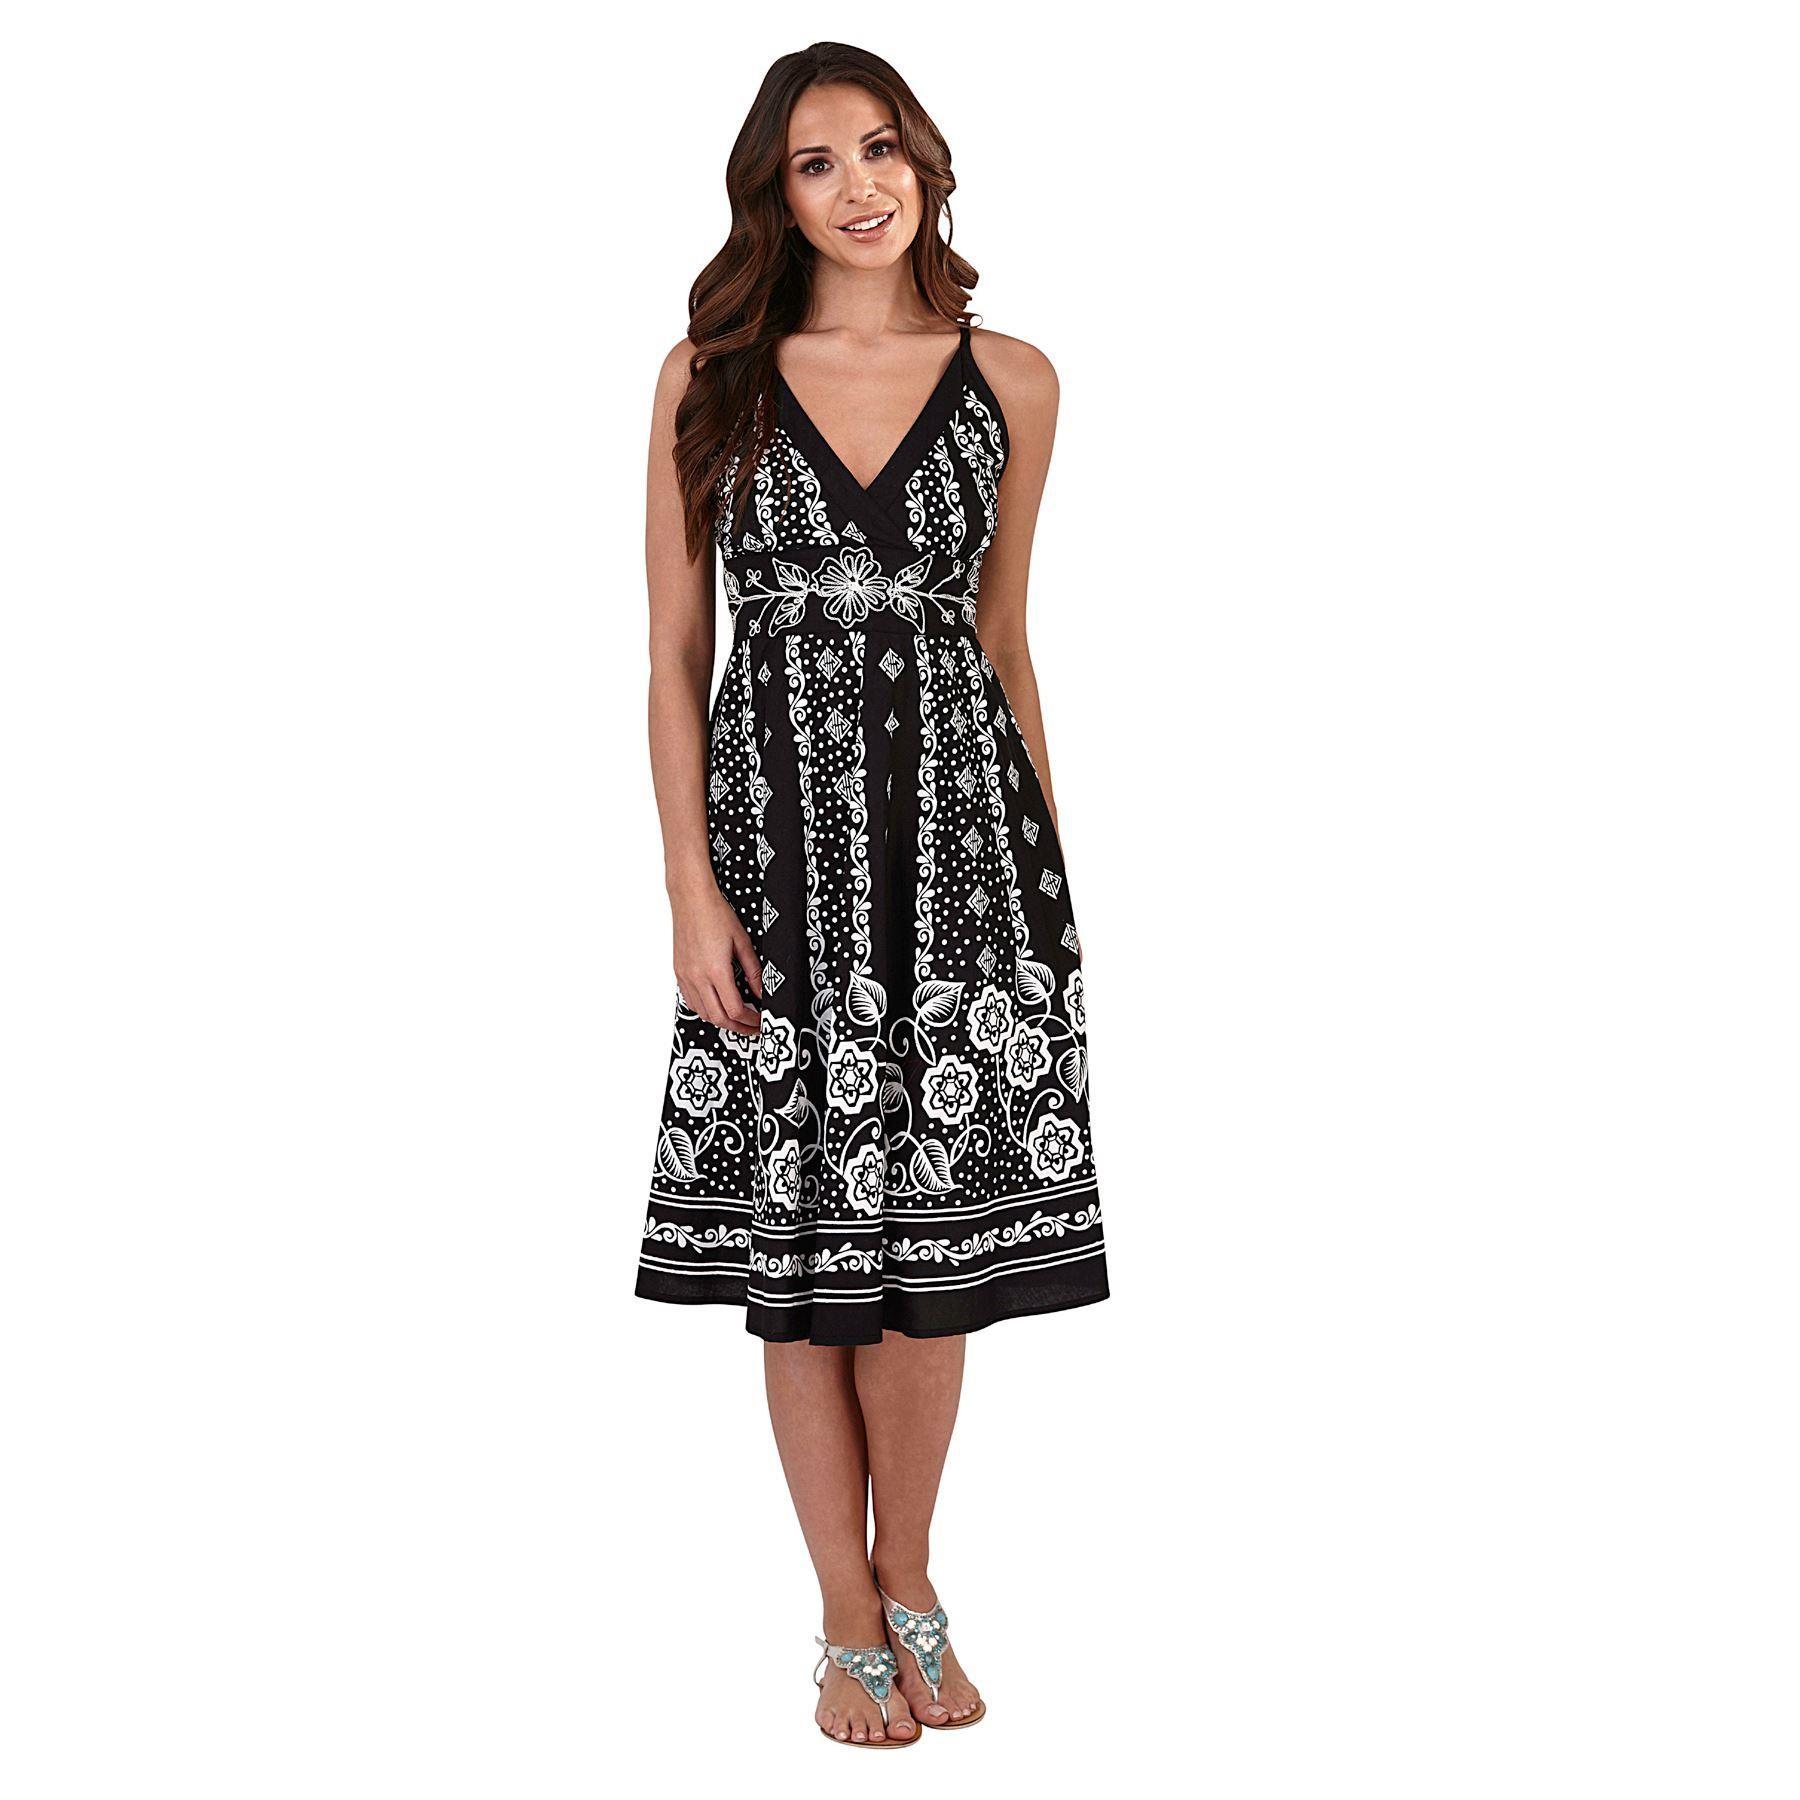 Pistachio Print Crossover Dress - Black/White